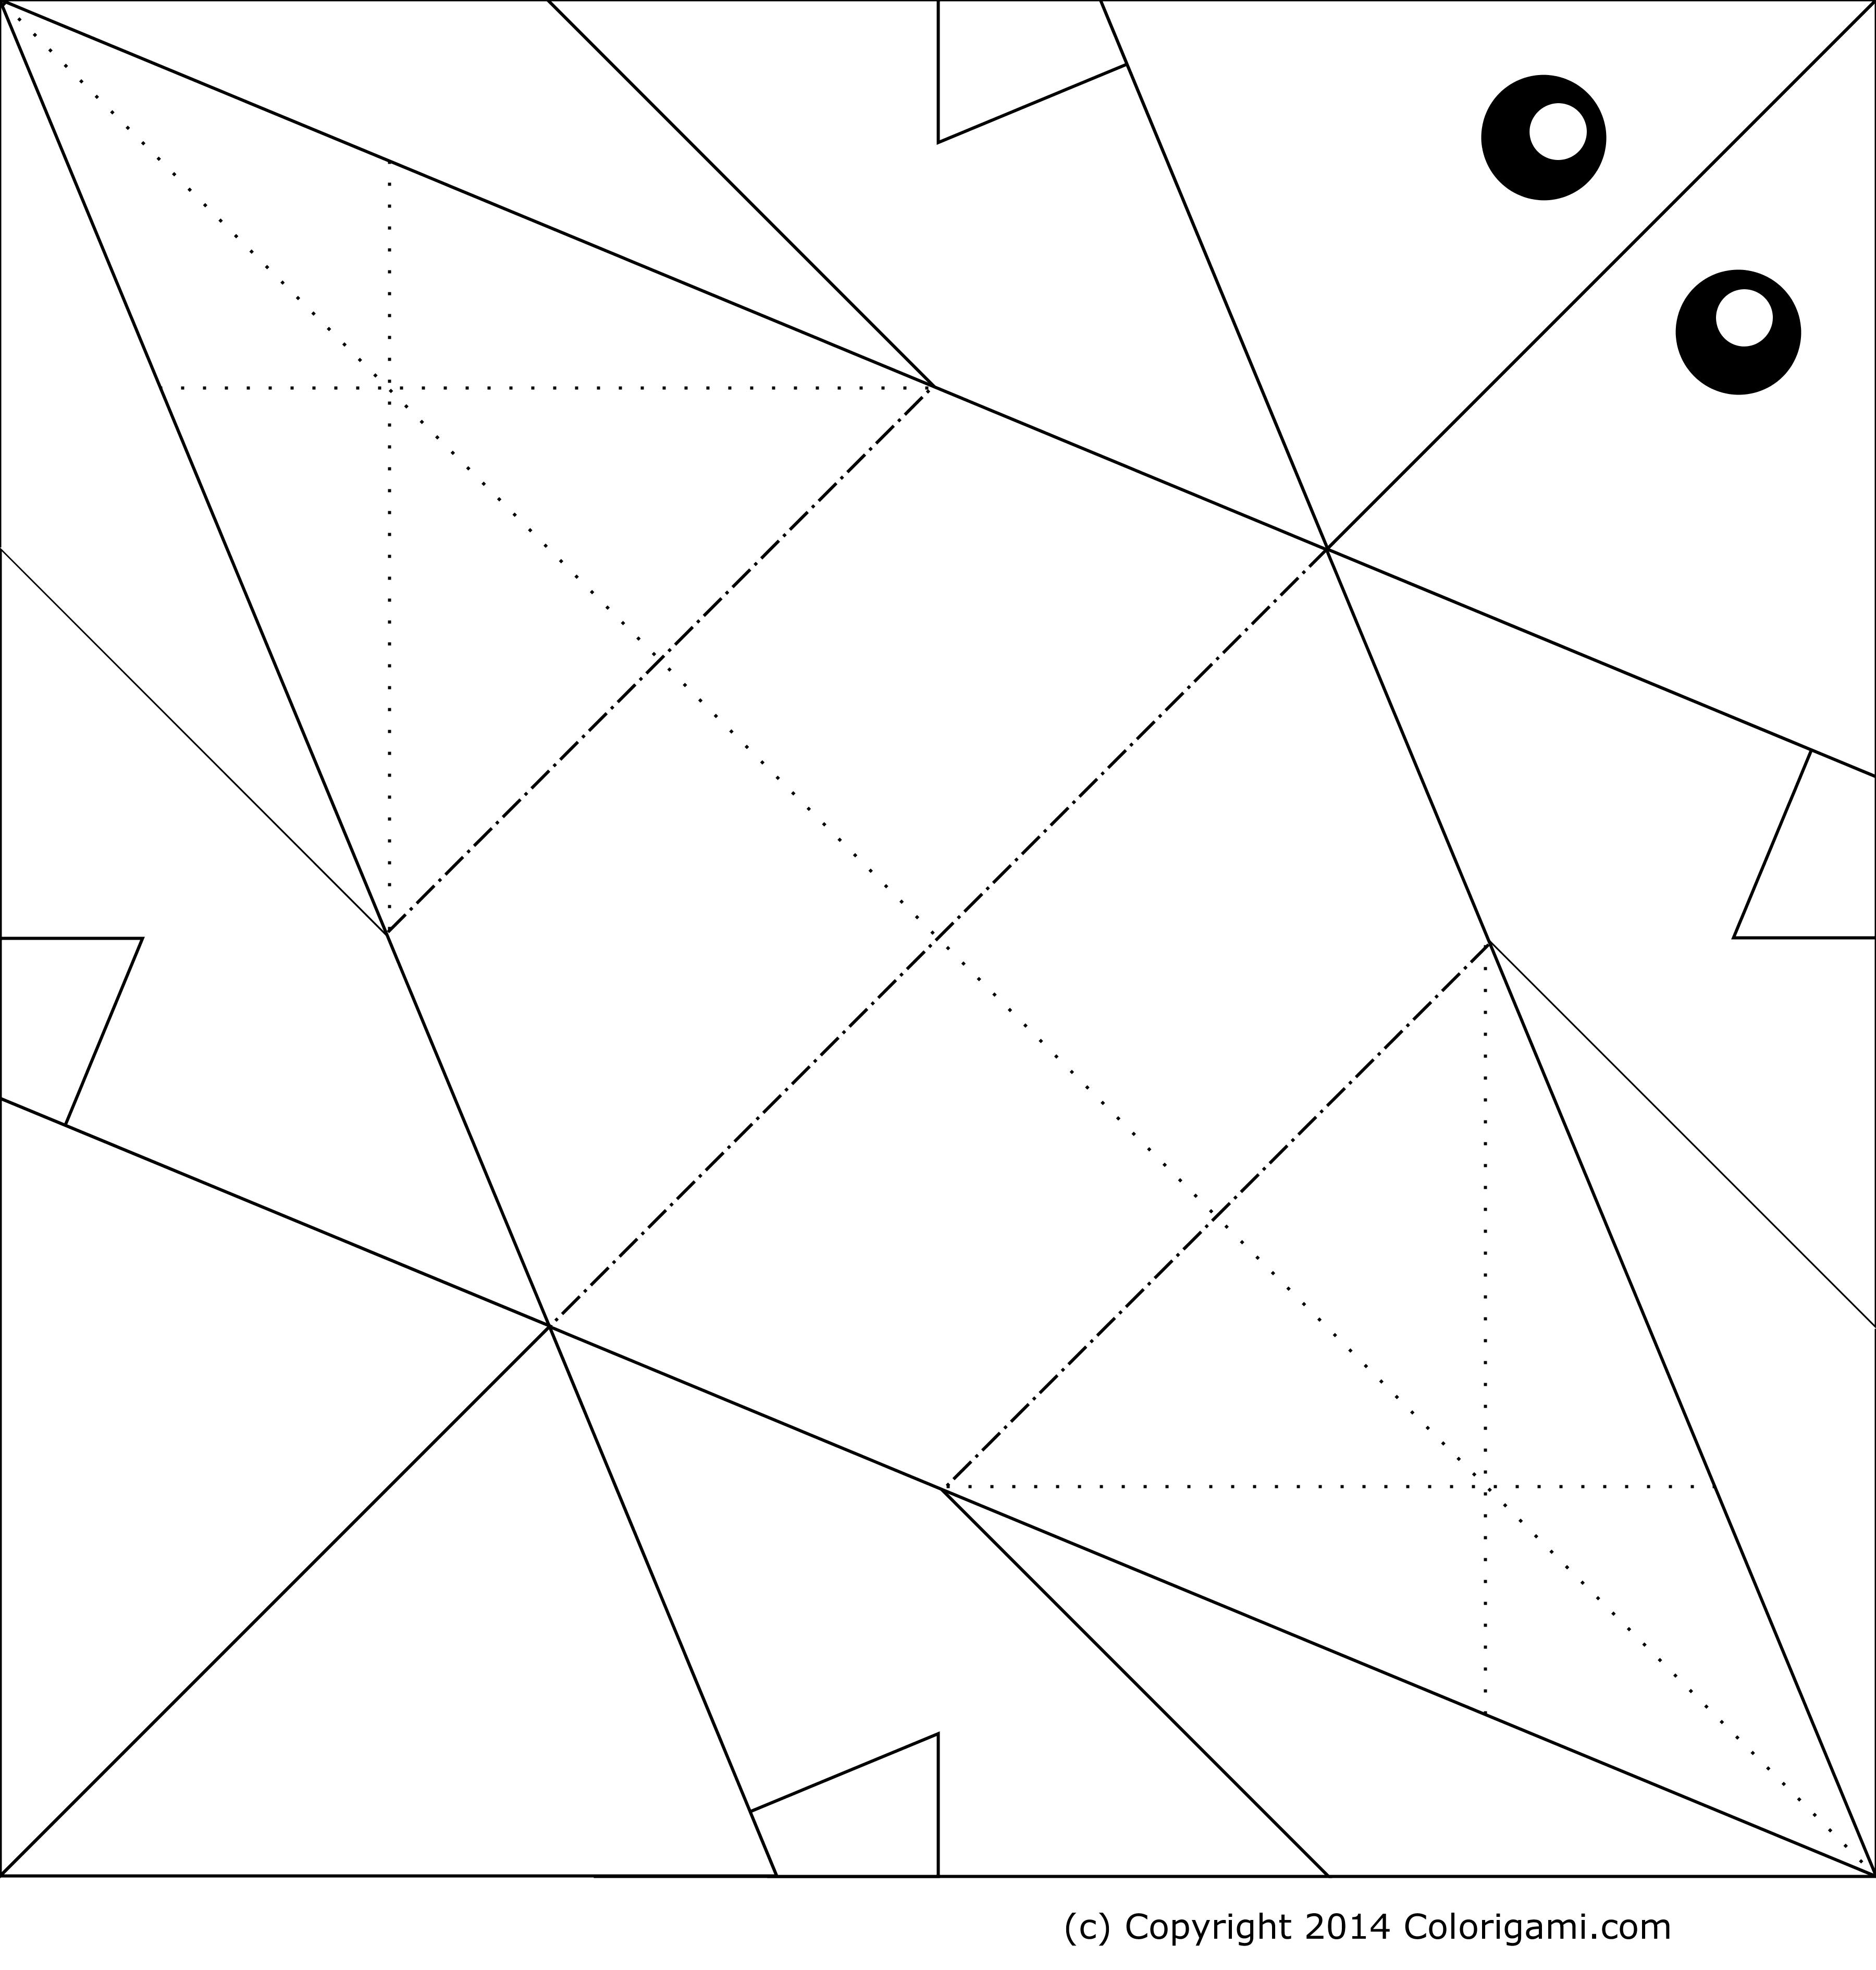 Origami coloring #1, Download drawings